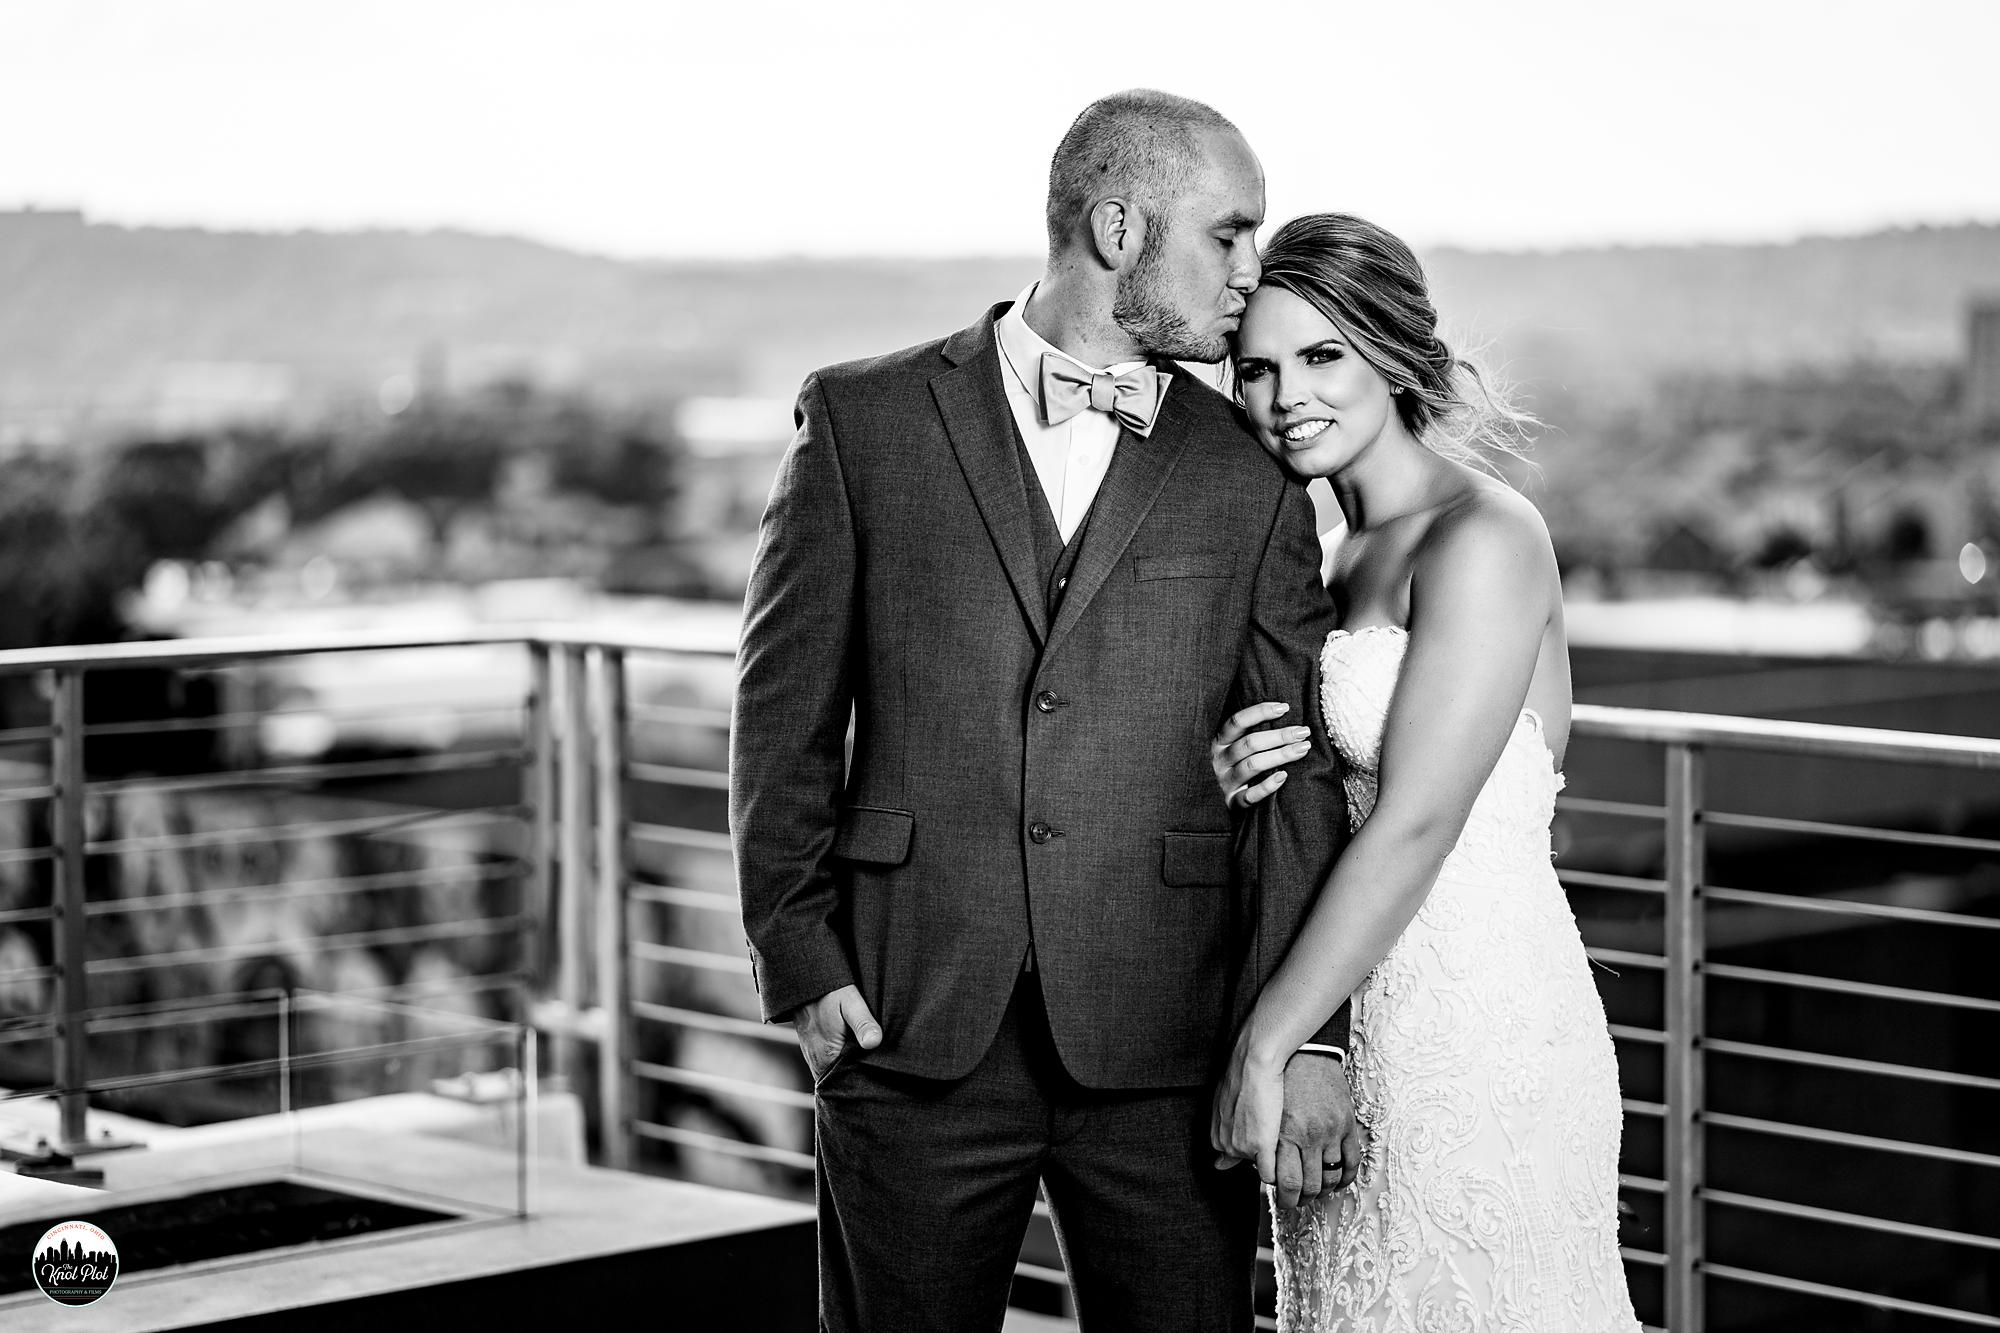 Strietmann-Penthaus-OTR-Cincinnati-Wedding-Photography-16.jpg